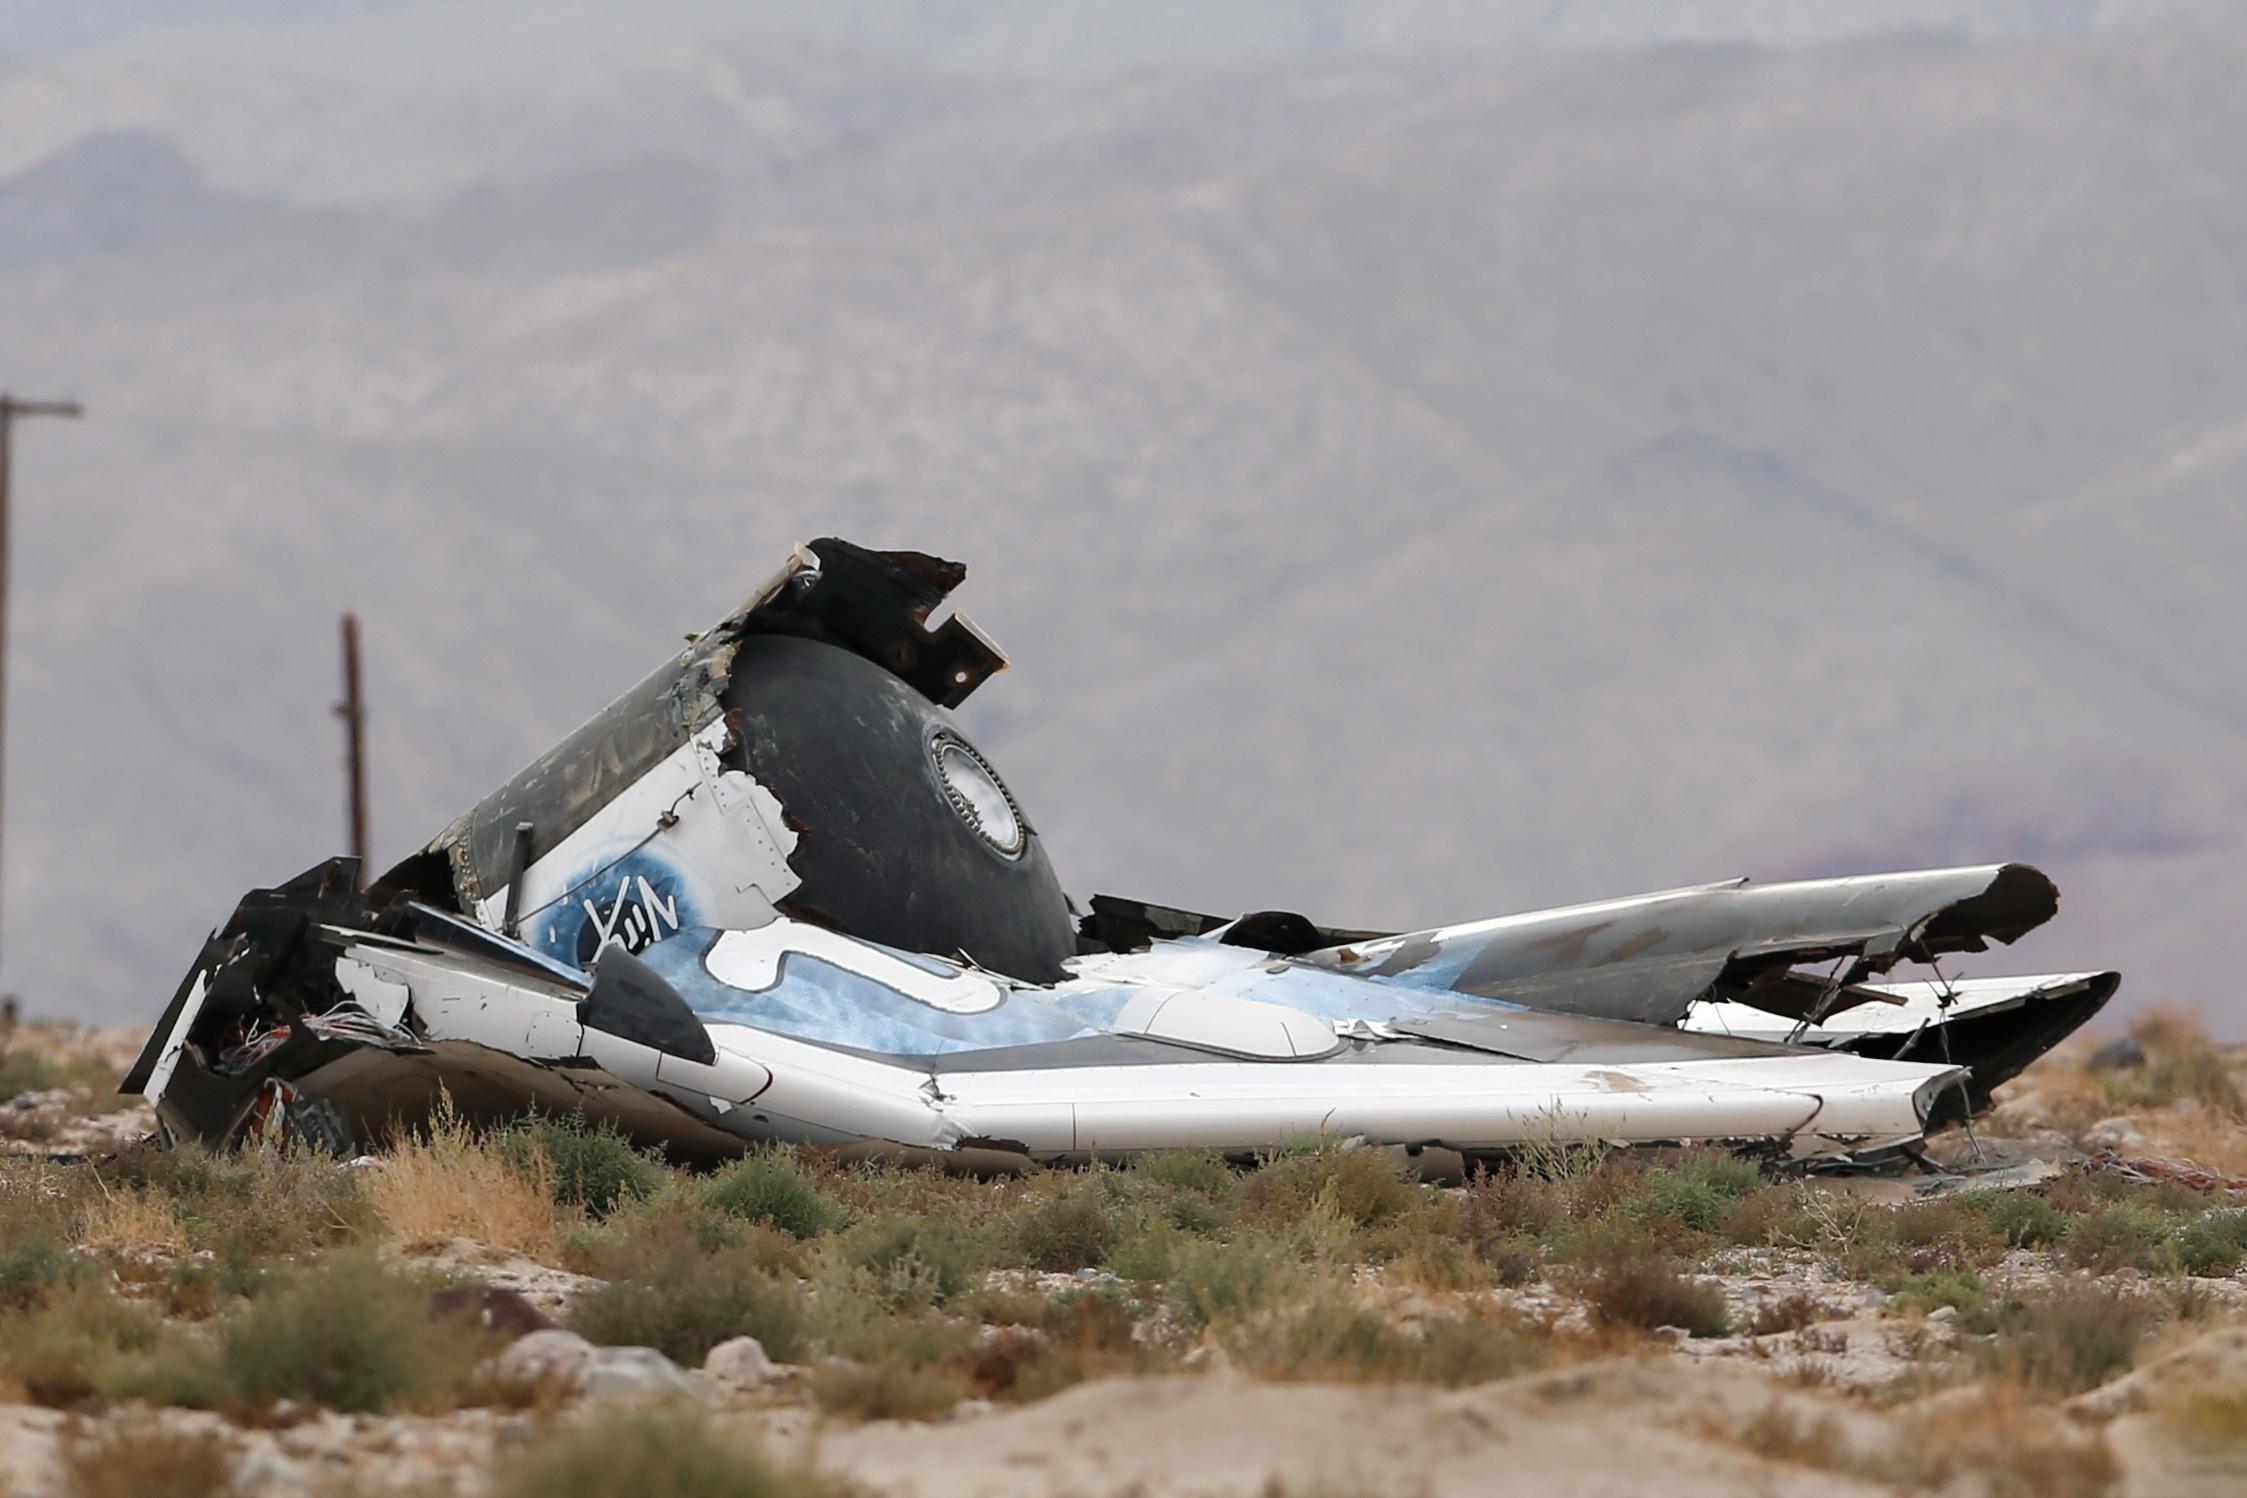 Test flight of Virgin Galactic spaceship ends in fatal crash in California